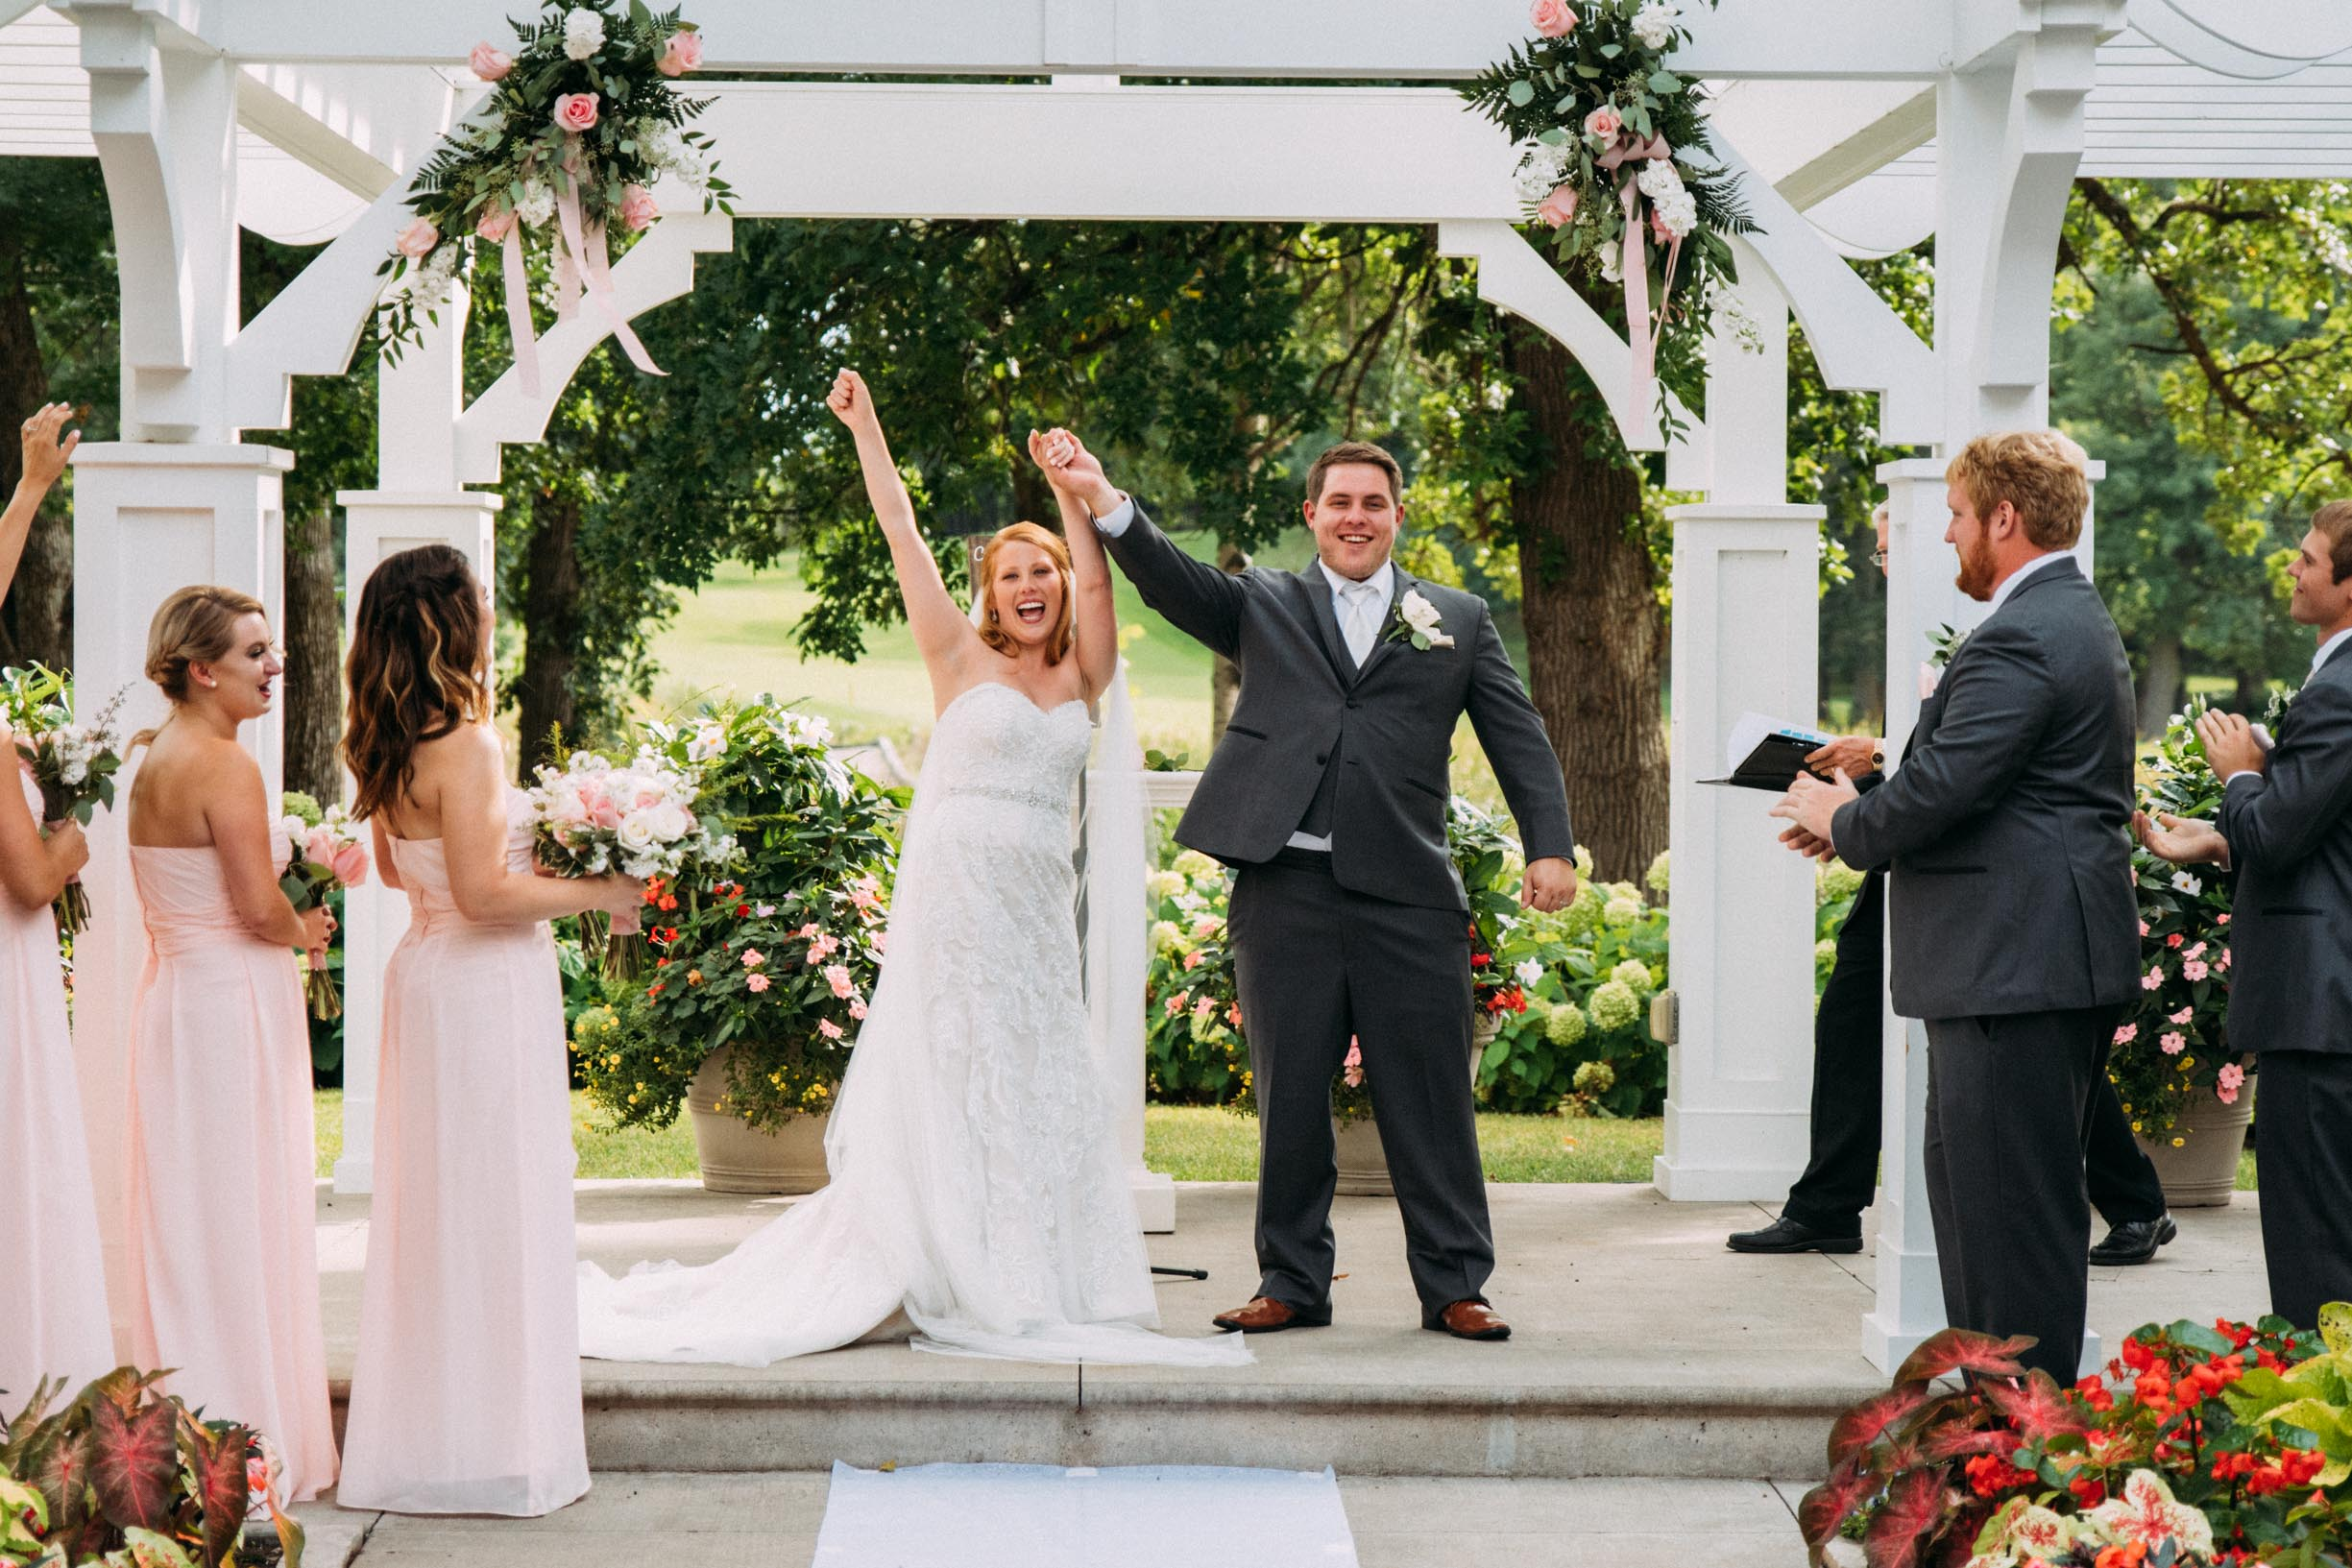 Megan_Zach_Minneapolis_Wedding_Ceremony_Blog-39.jpg